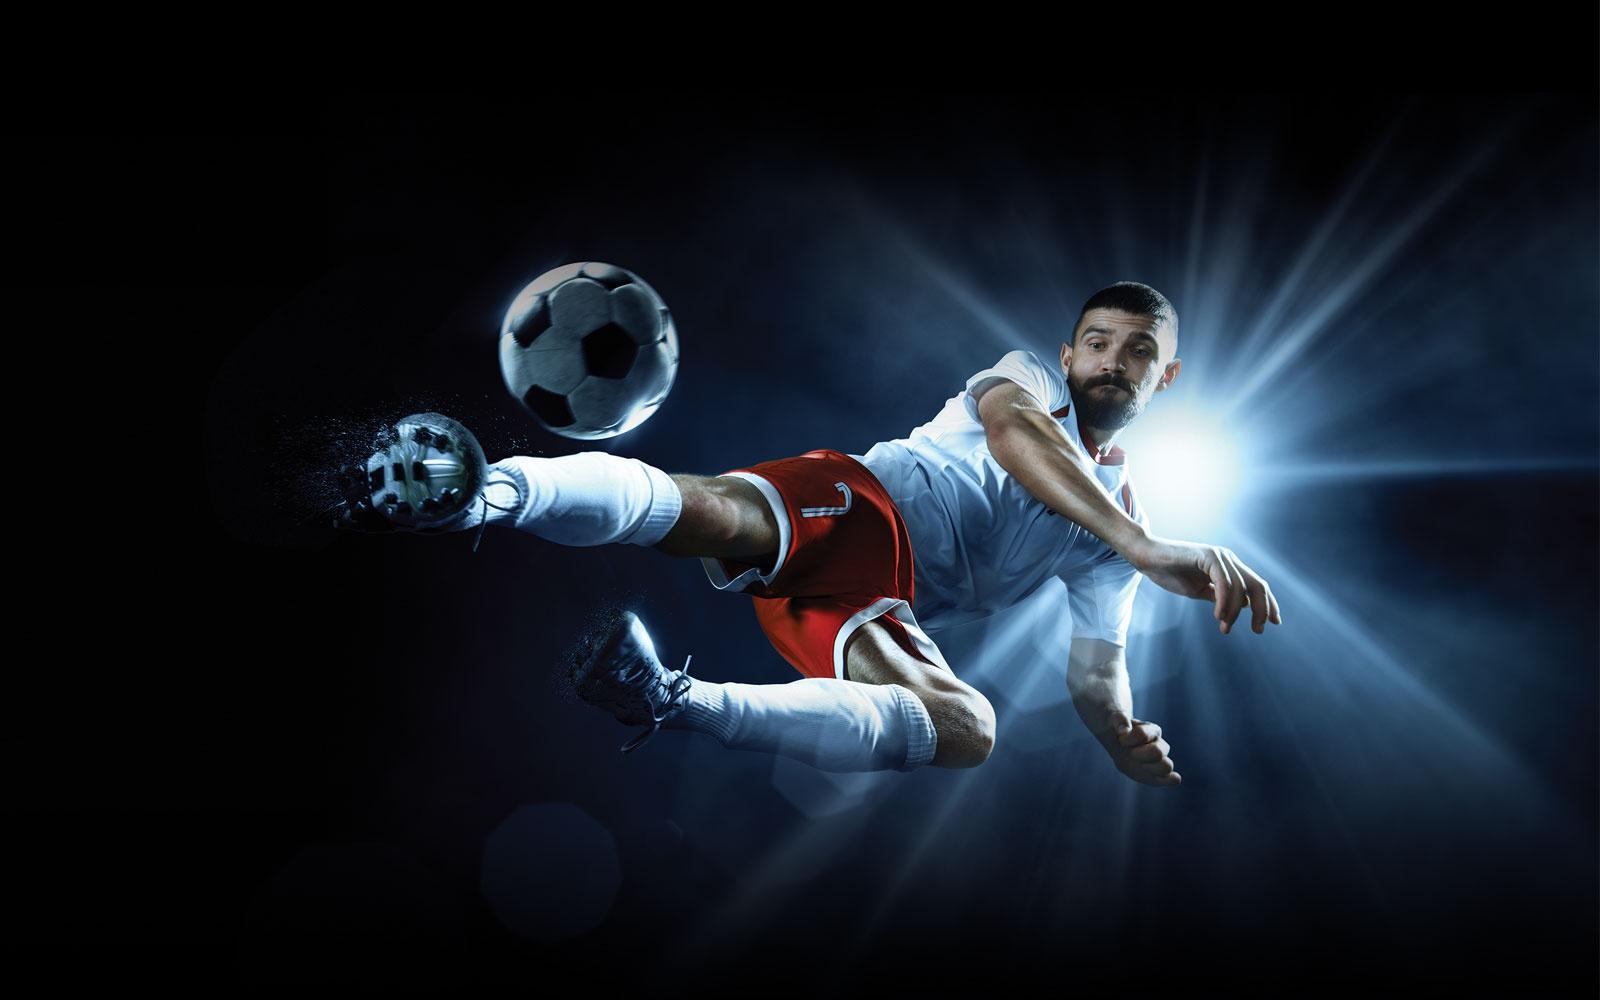 Professional footballer kicking a football